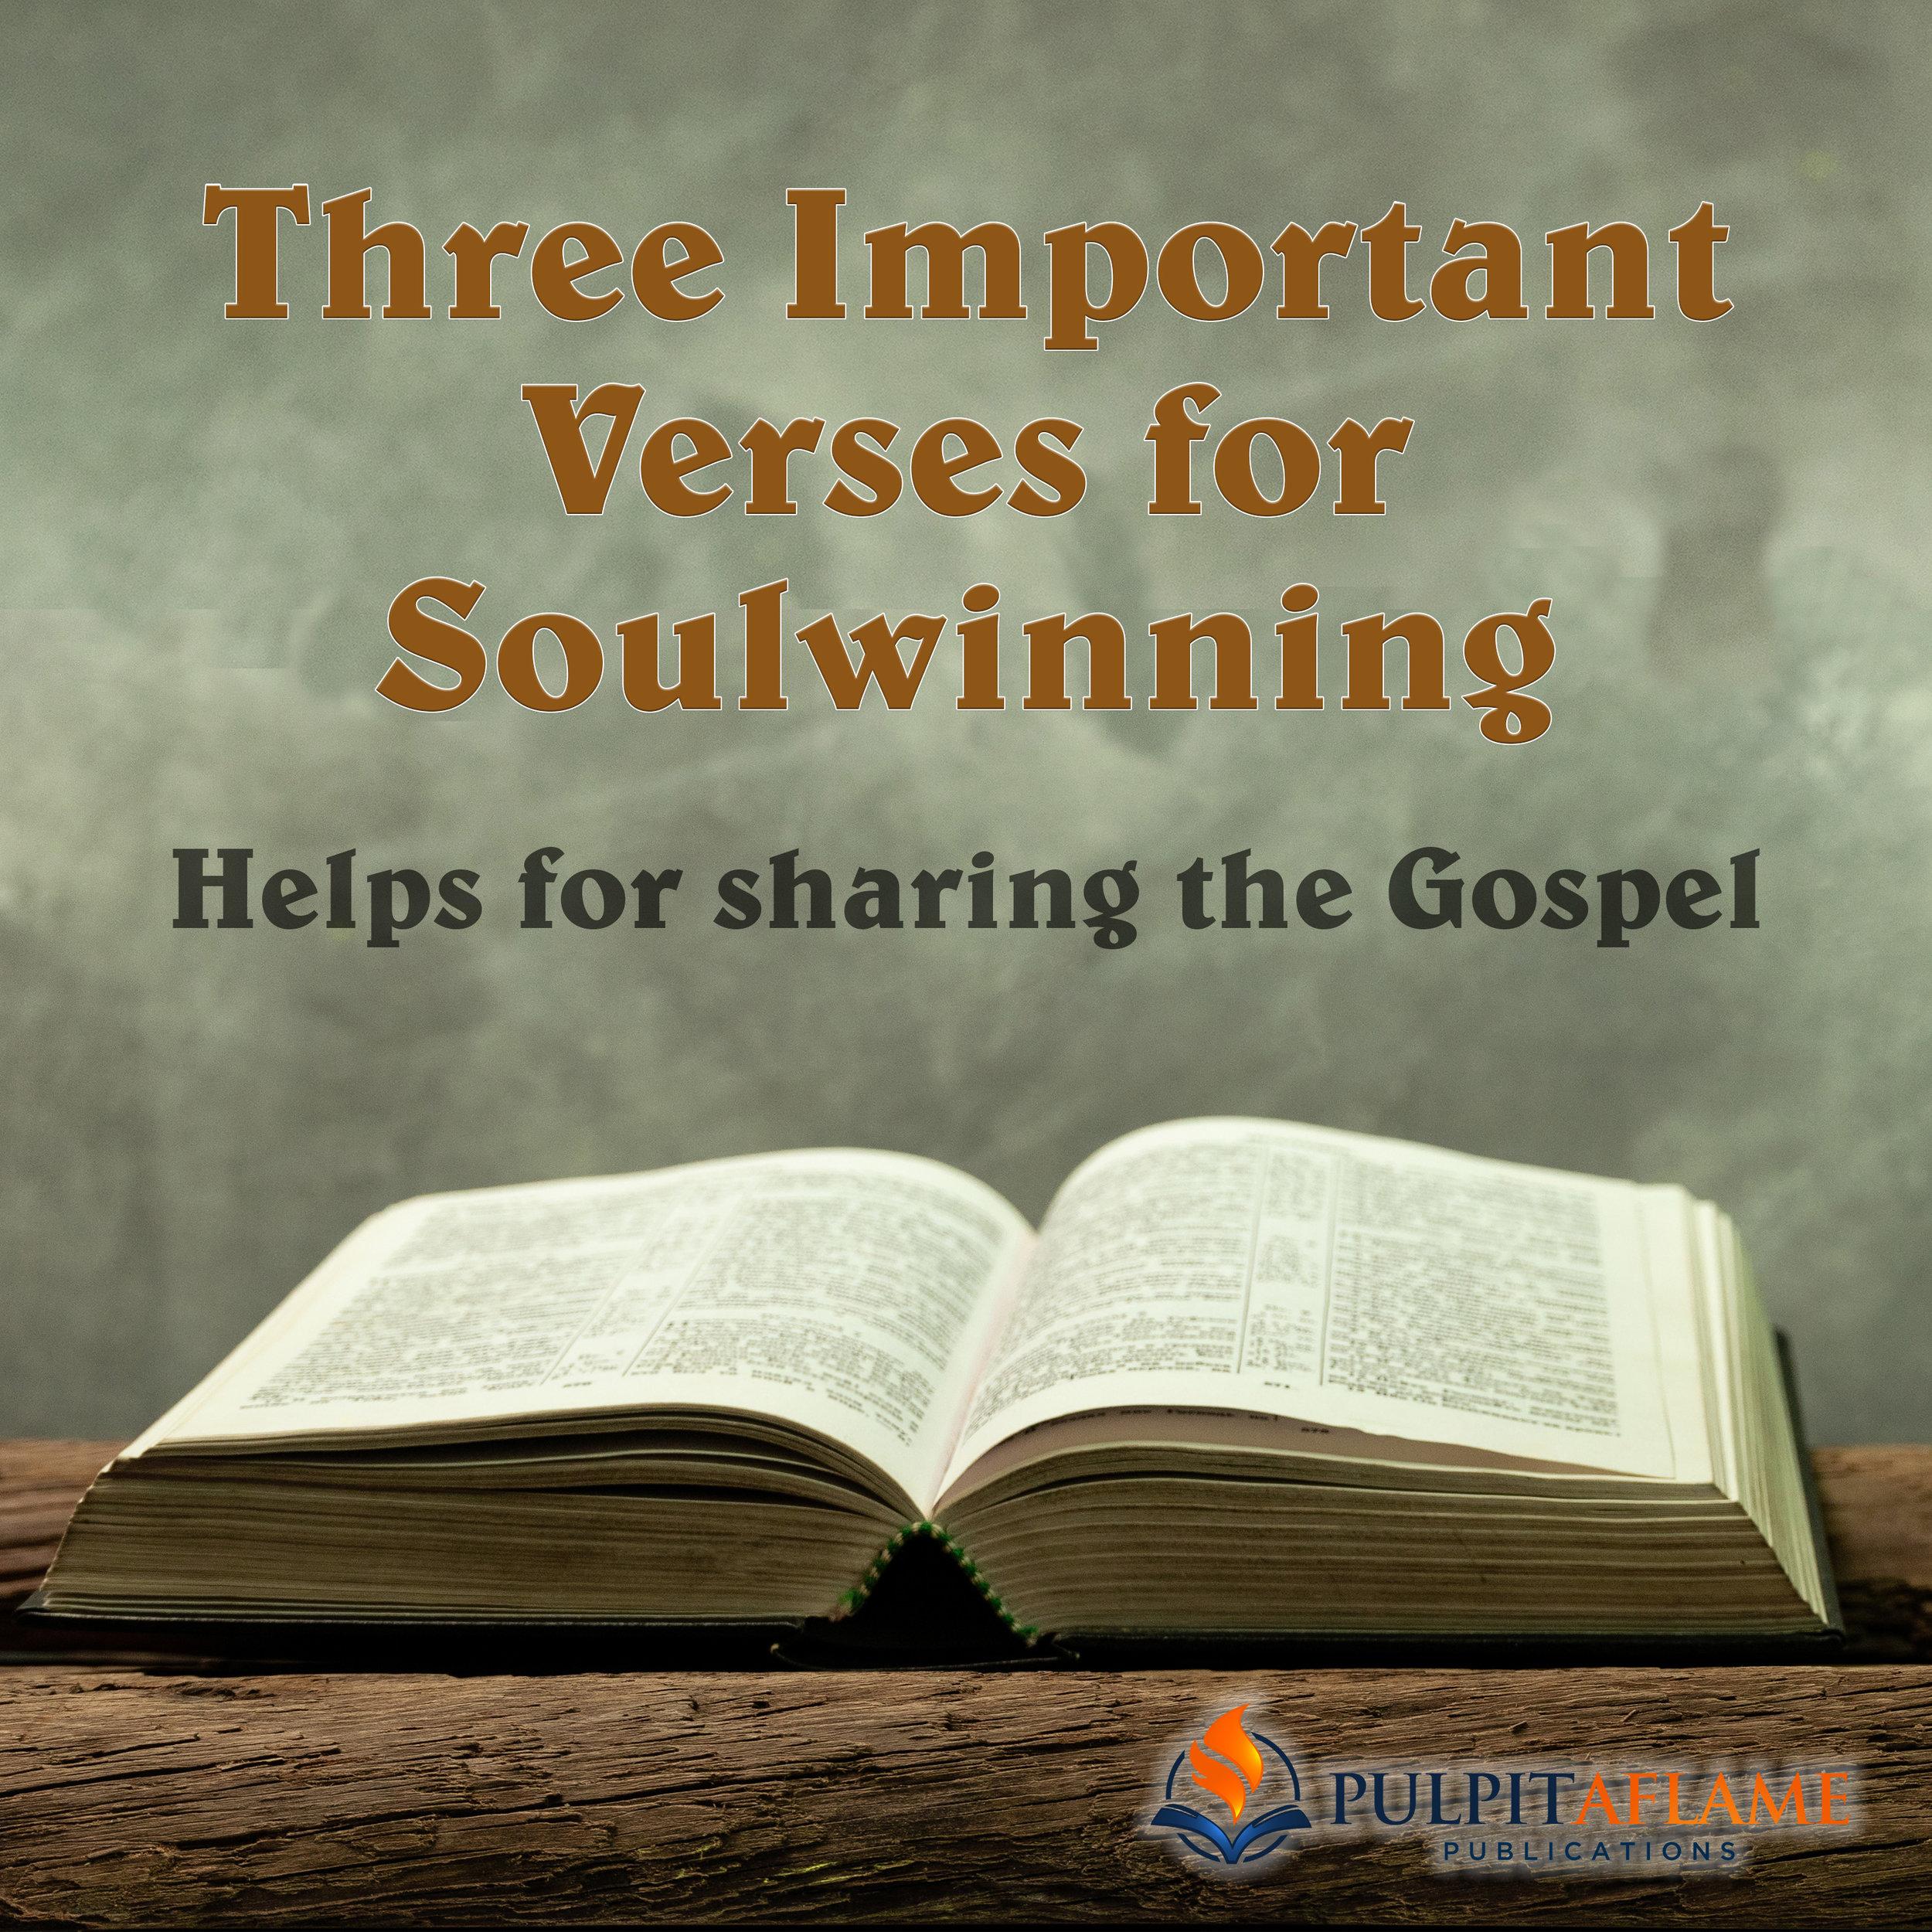 Three Verses for Soulwinning thumbnail.jpg